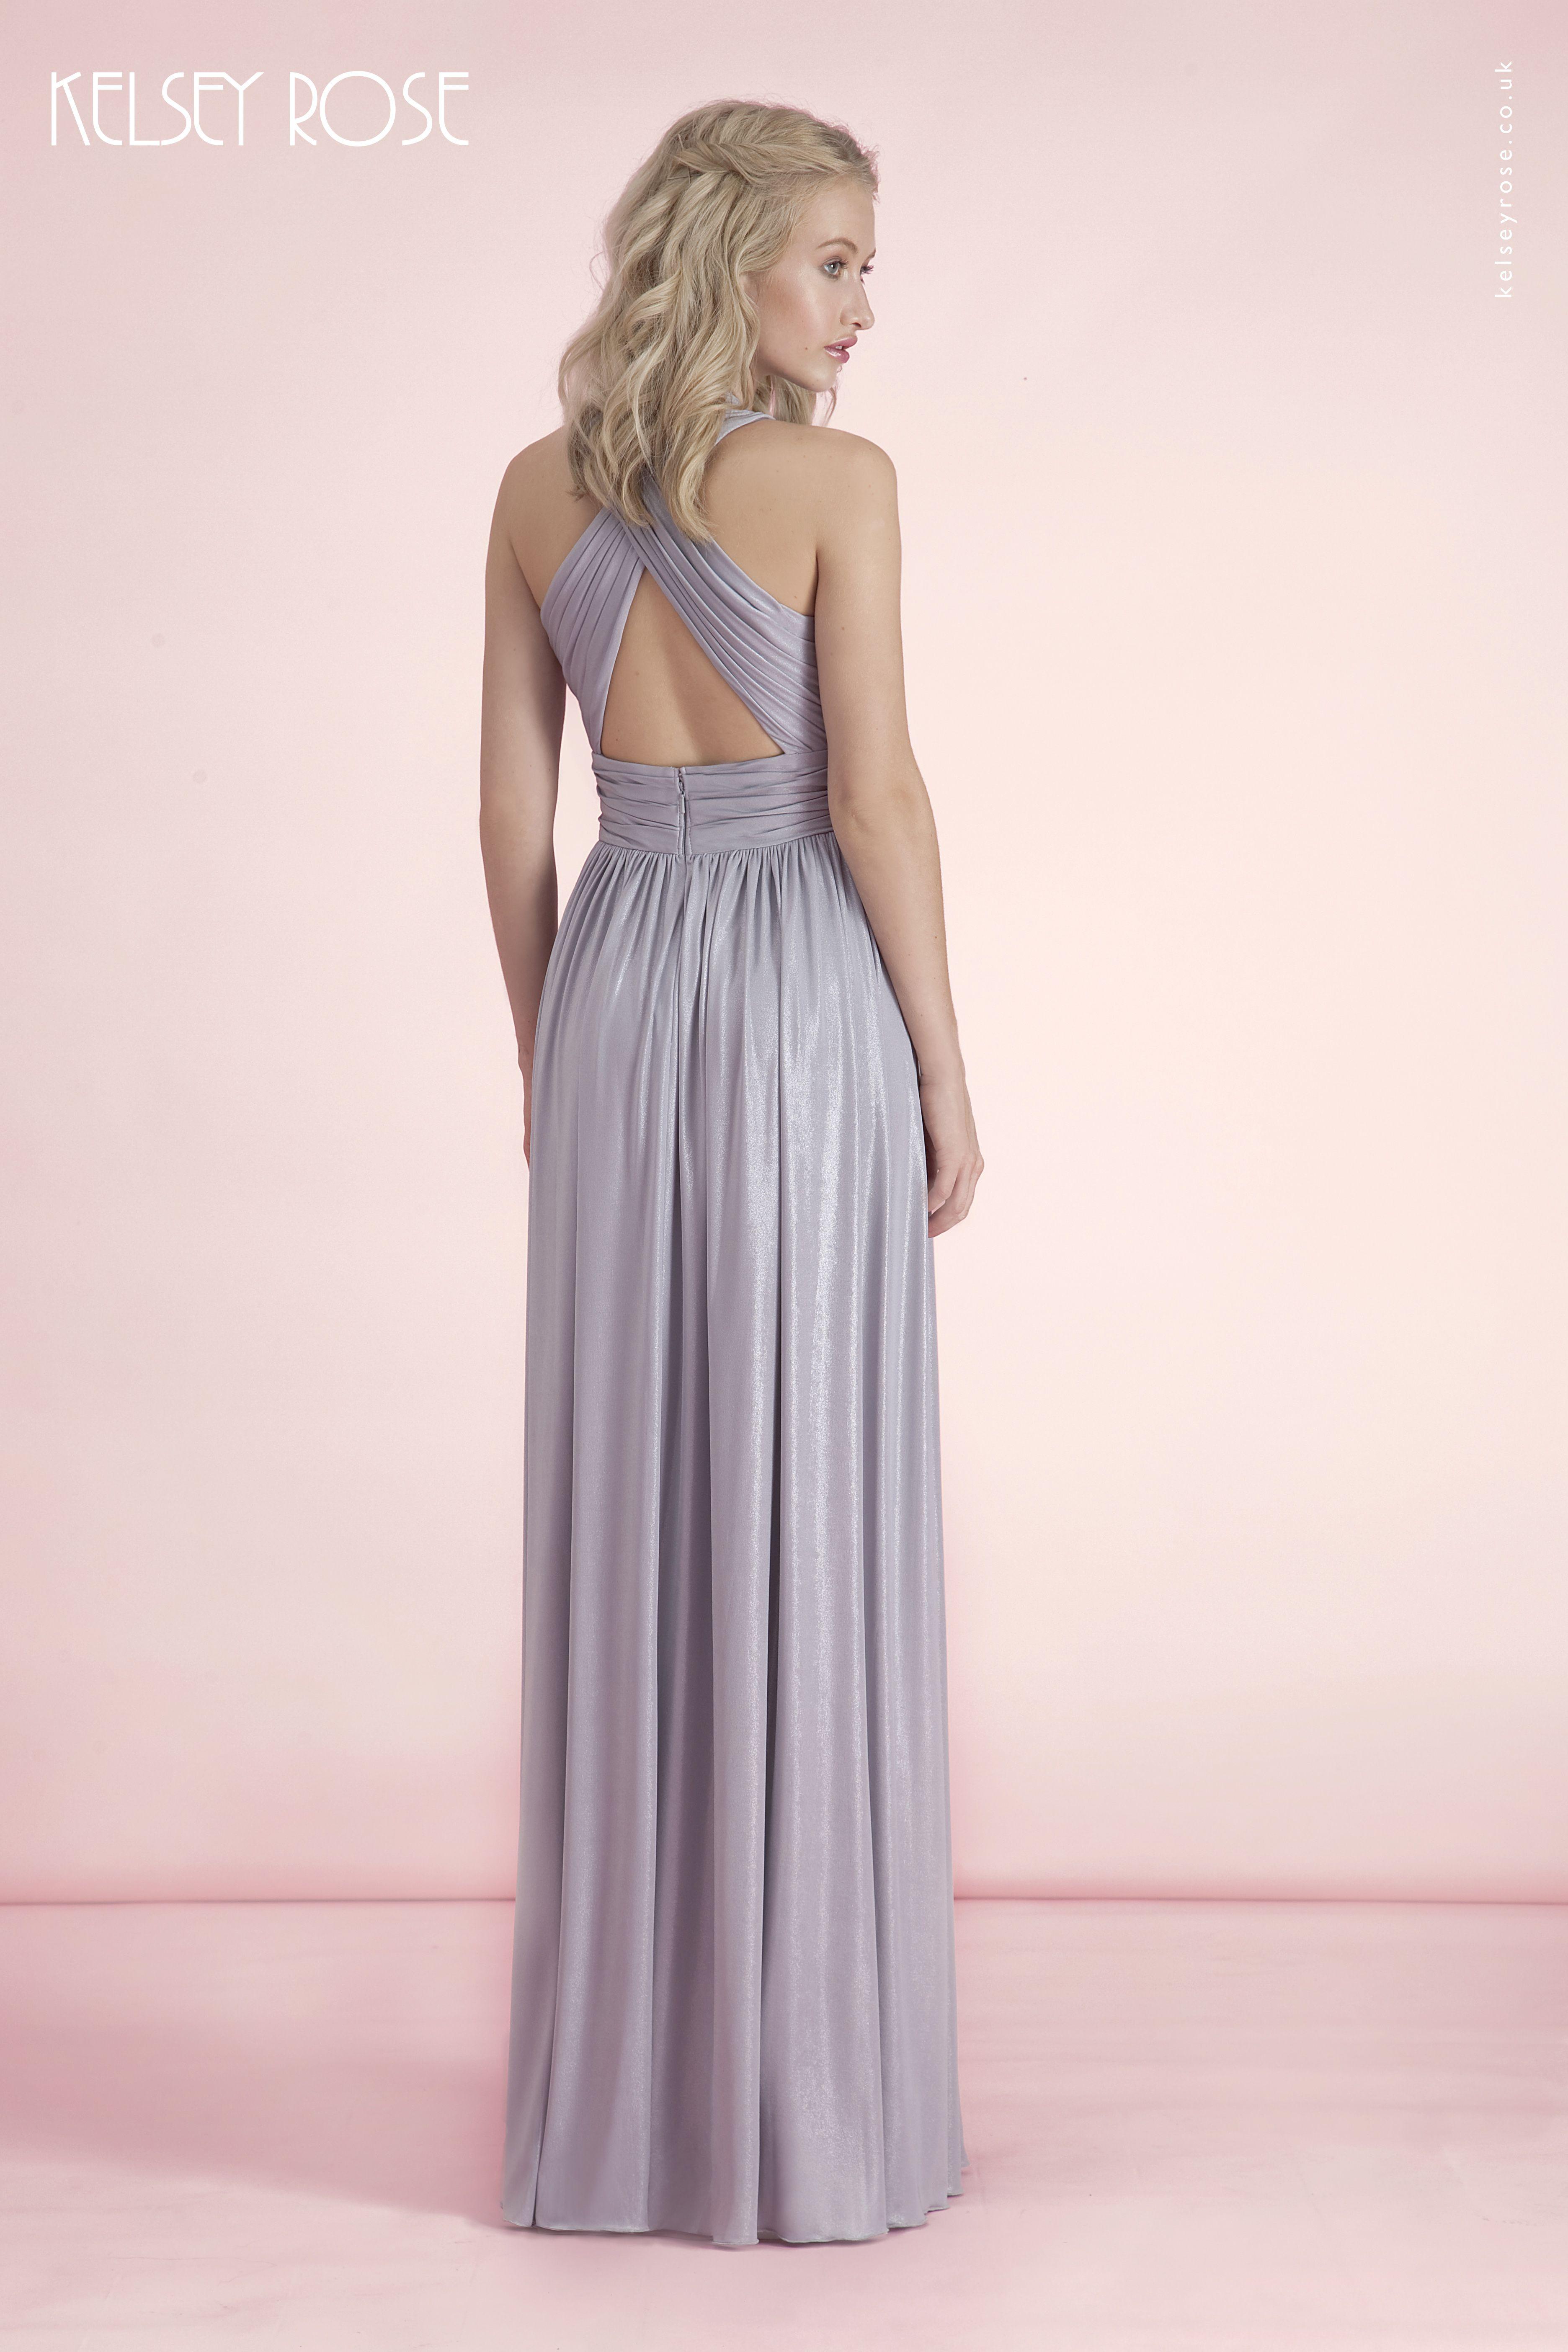 Kelsey Rose Bridesmaid Style 50114 | Wedding Bridesmaids Dresses ...